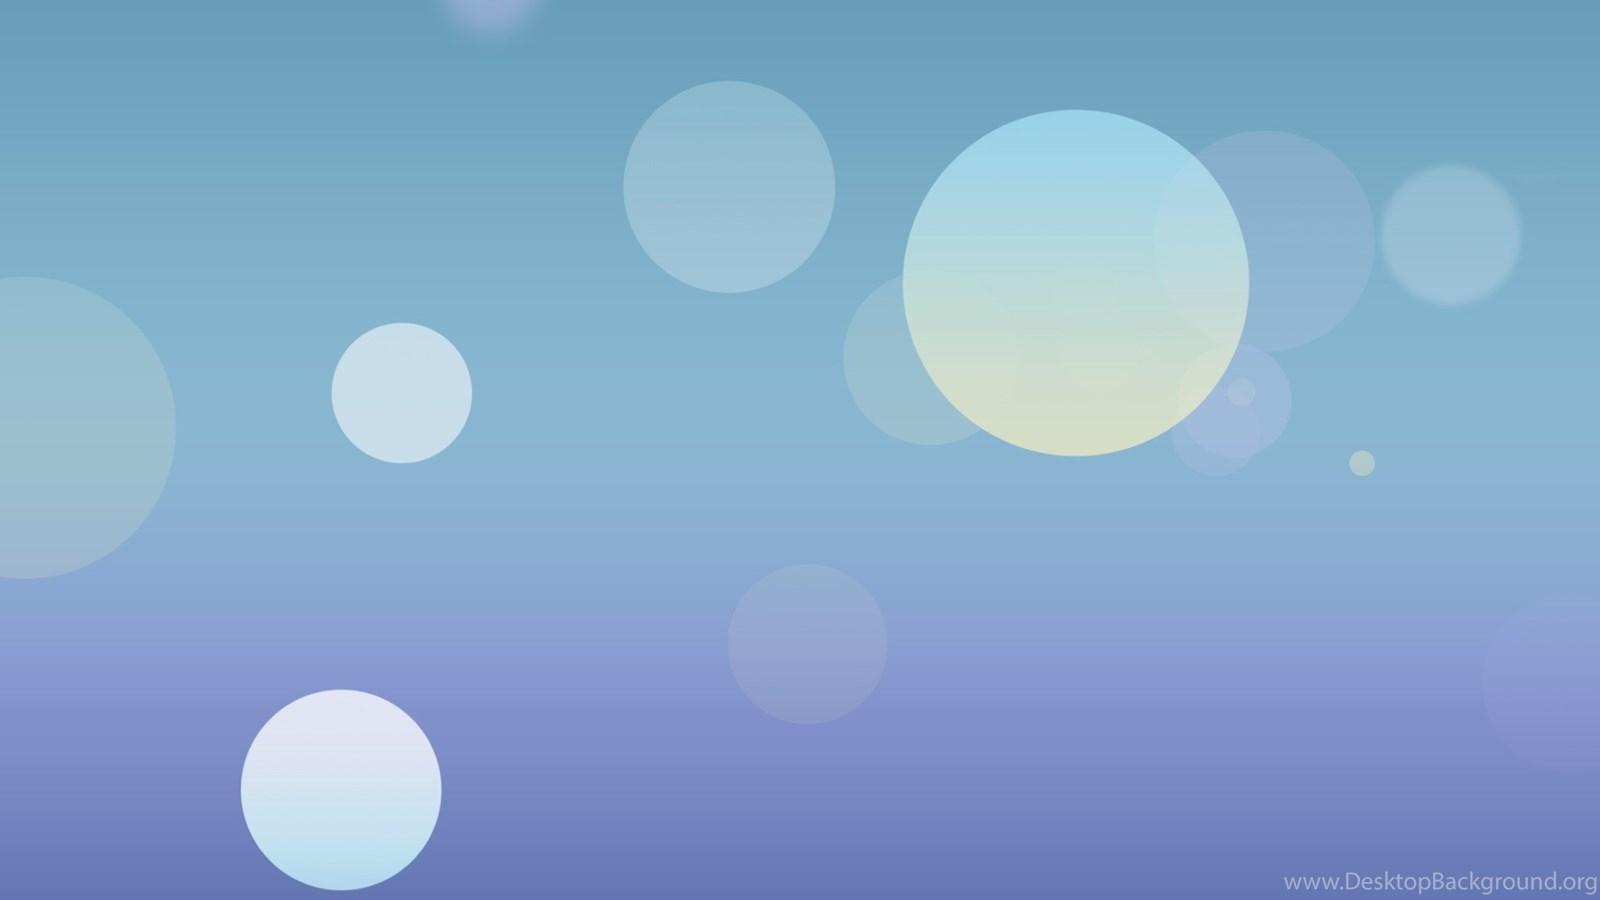 Iphone 7 Wallpapers Hd: Iphone Ios 7 Wallpapers Hd Desktop Background